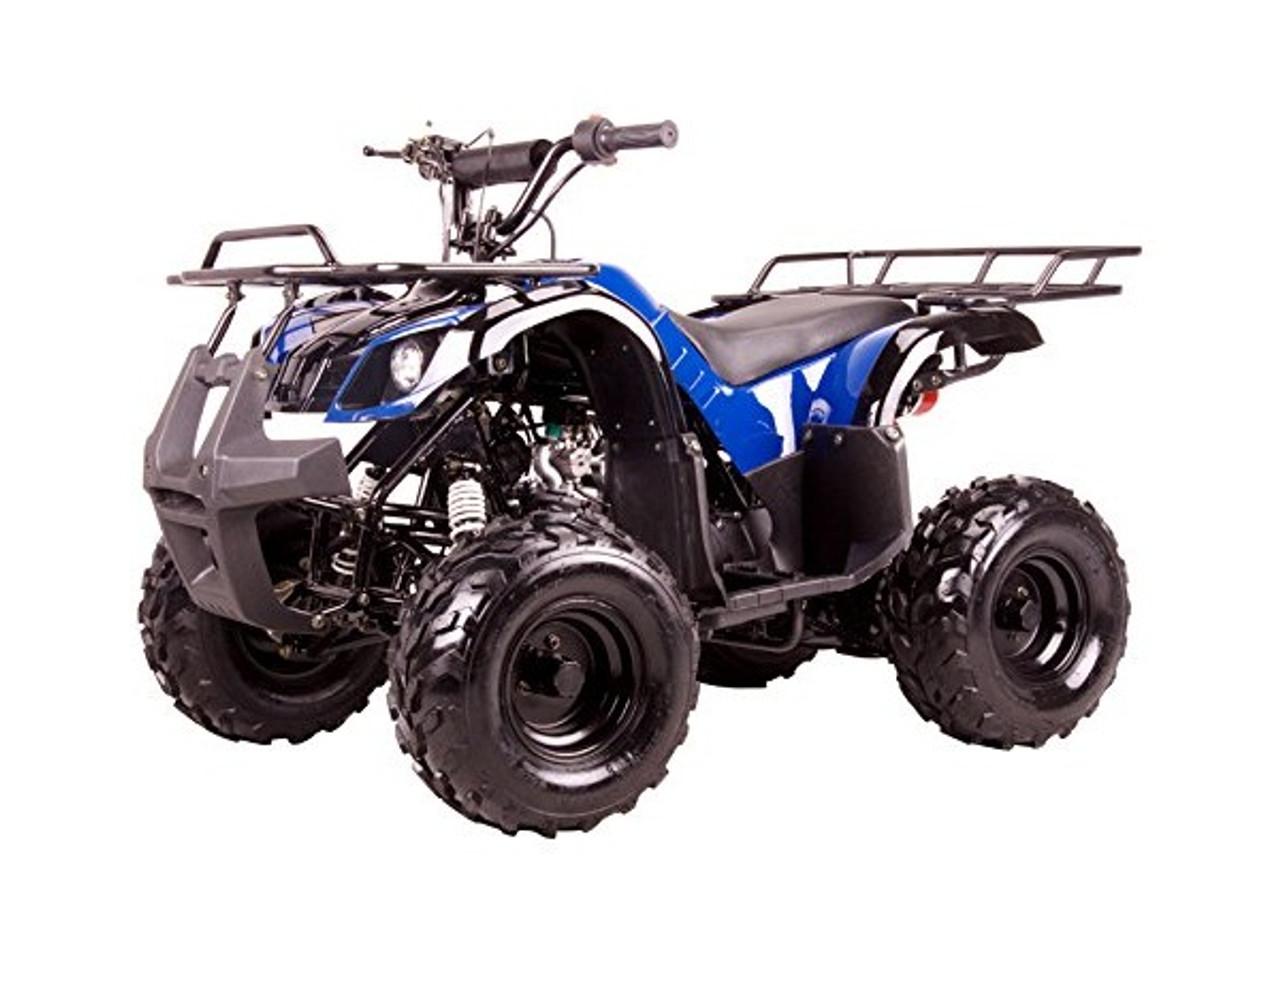 "Coolster ATV-3050D Kodiak-Hd 110CC Youth Atv - Big 16"" Tires, 110CC Air Cooled, Single Cylinder, 4-Stroke"